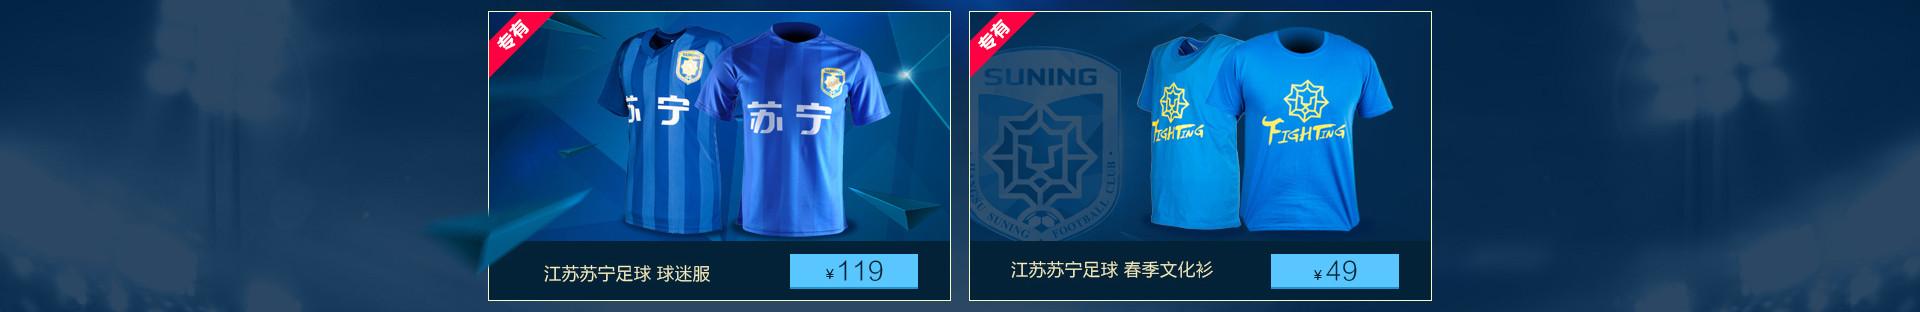 http://image.suning.cn/uimg/sop/commodity/857986553192847355773710_x.jpg